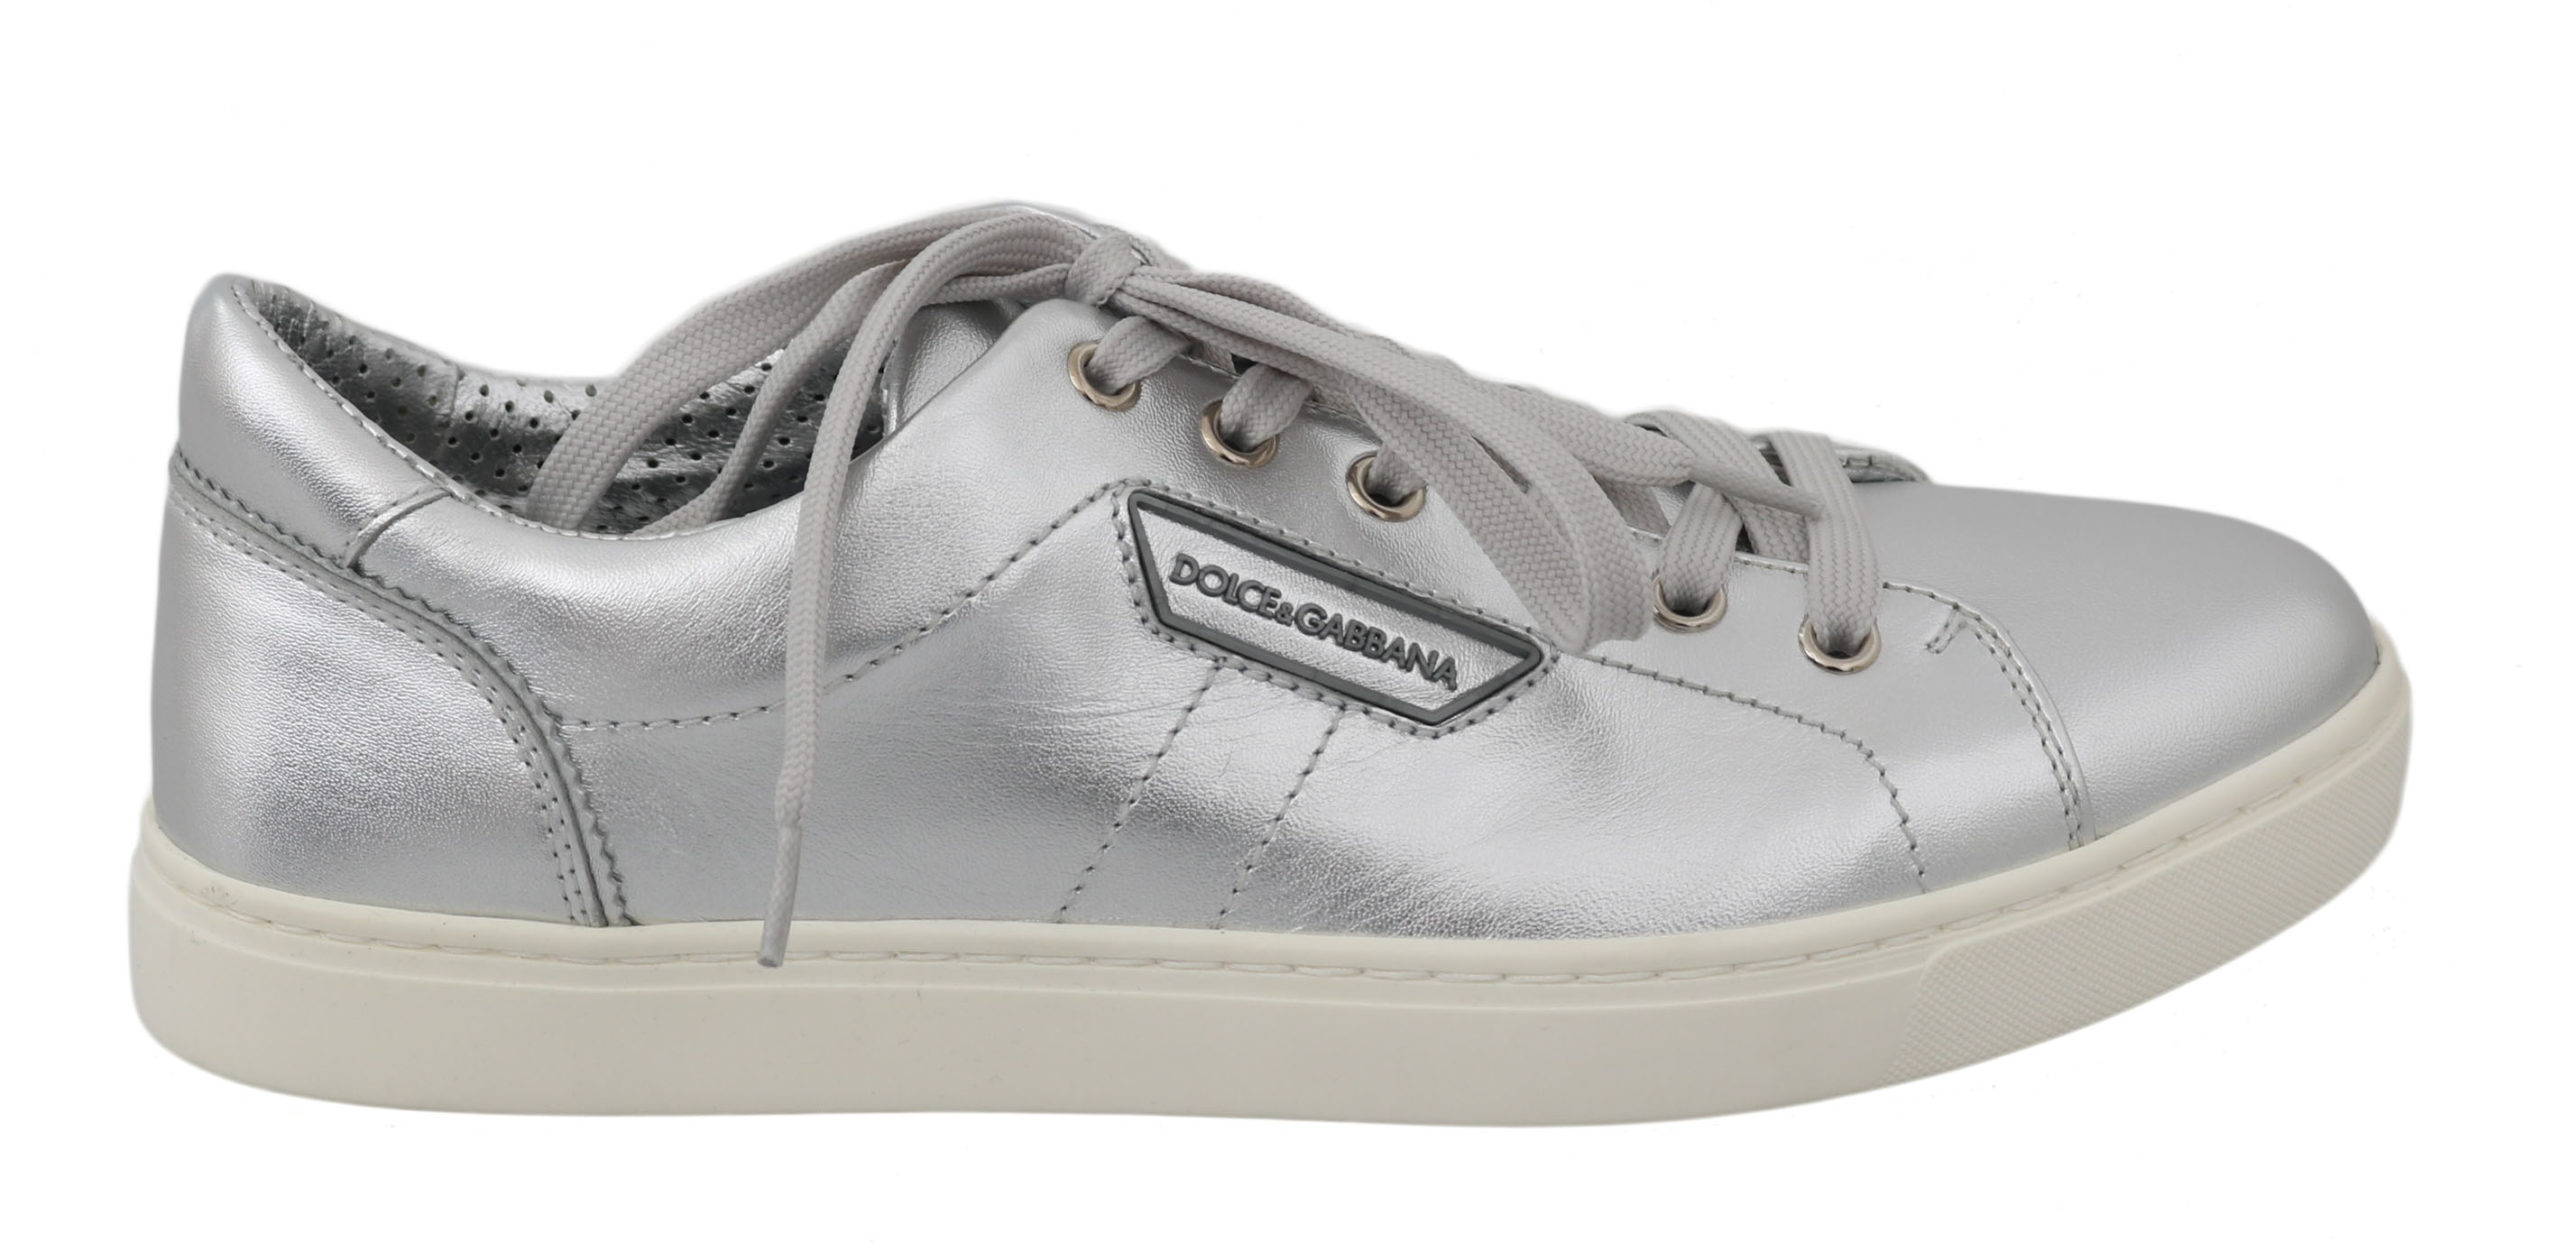 Dolce & Gabbana Men's Leather Casual Trainer Silver MV2329 - EU39/US6